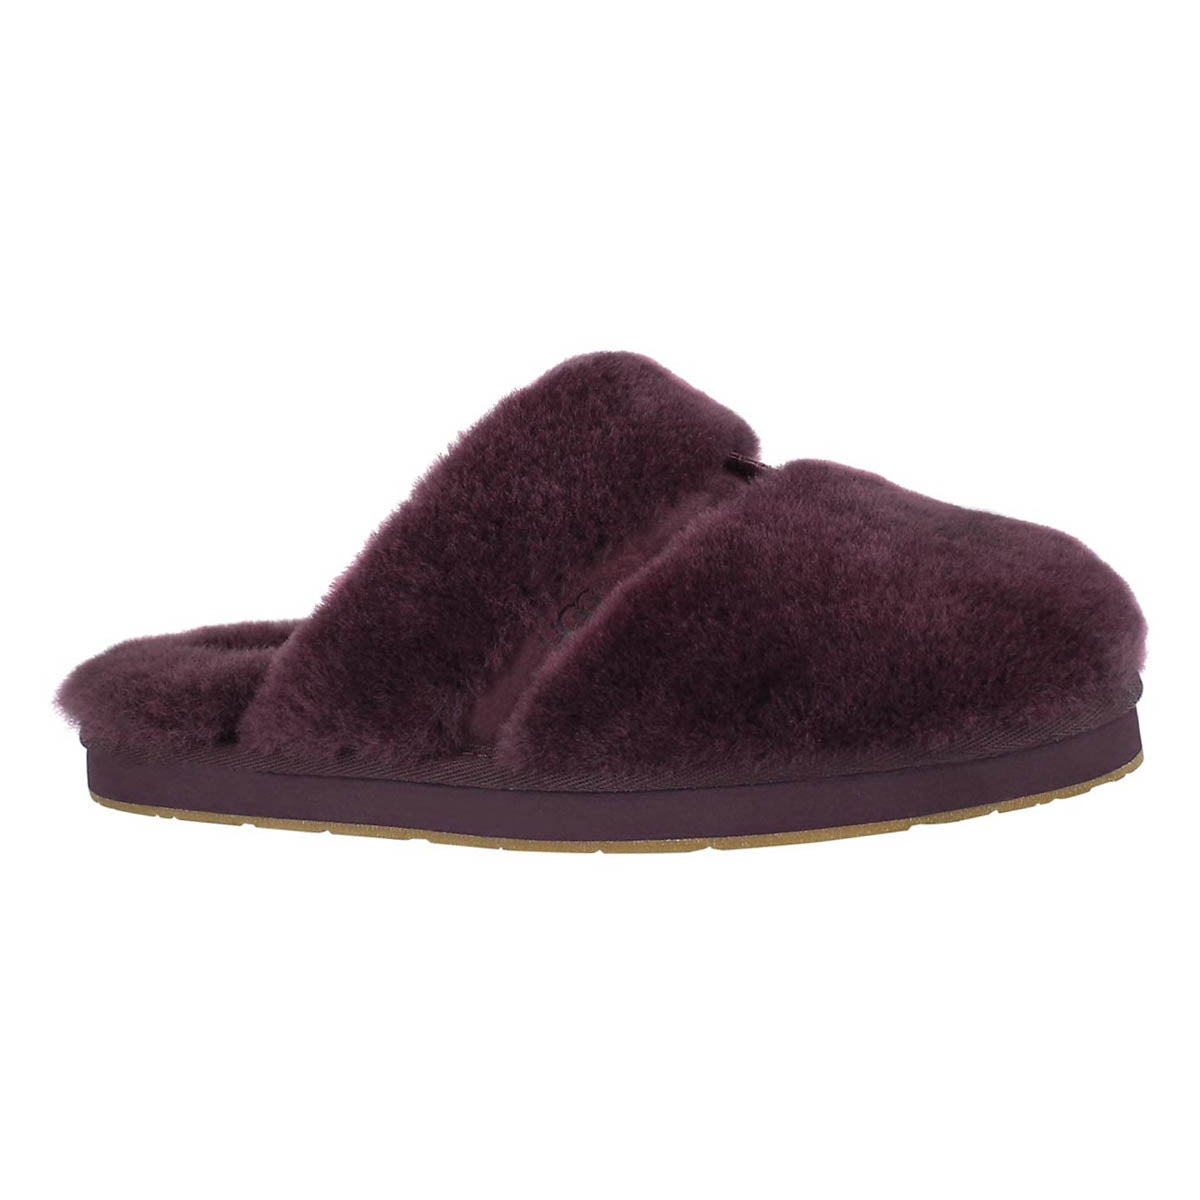 Women's DALLA port sheepskin slippers